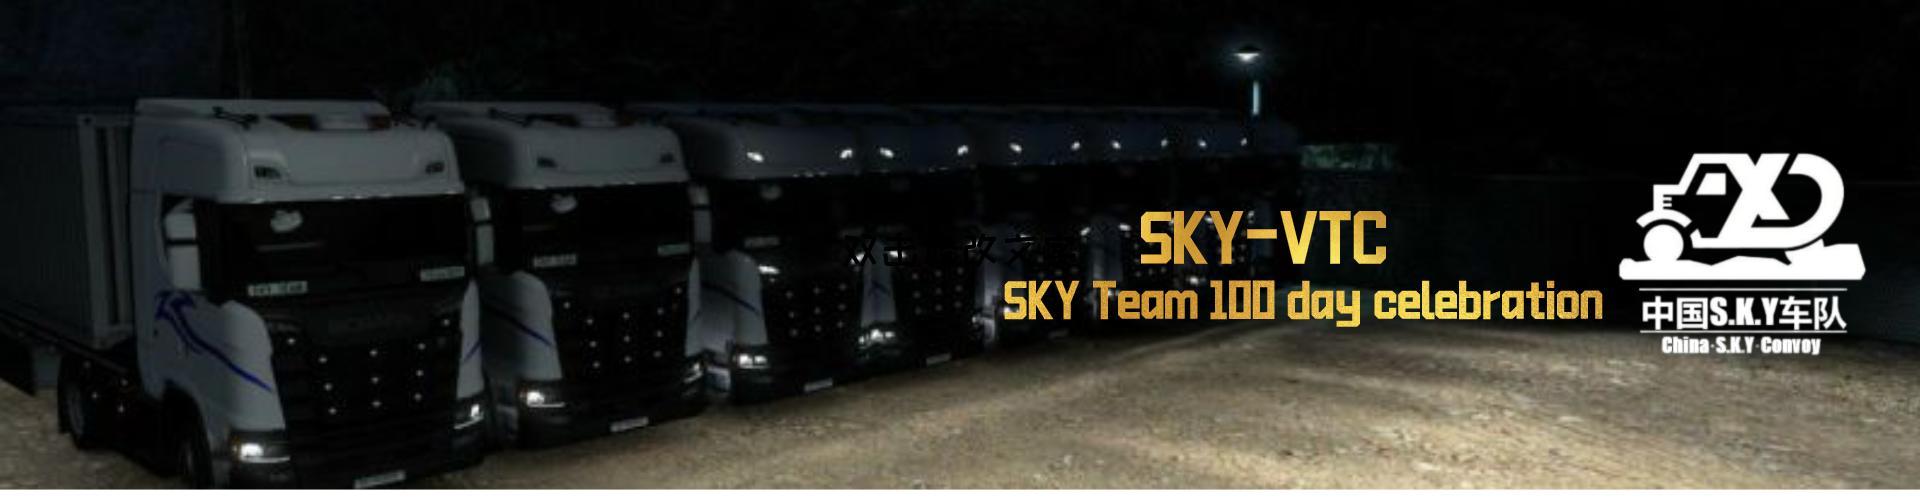 SKY Team 100 day celebration